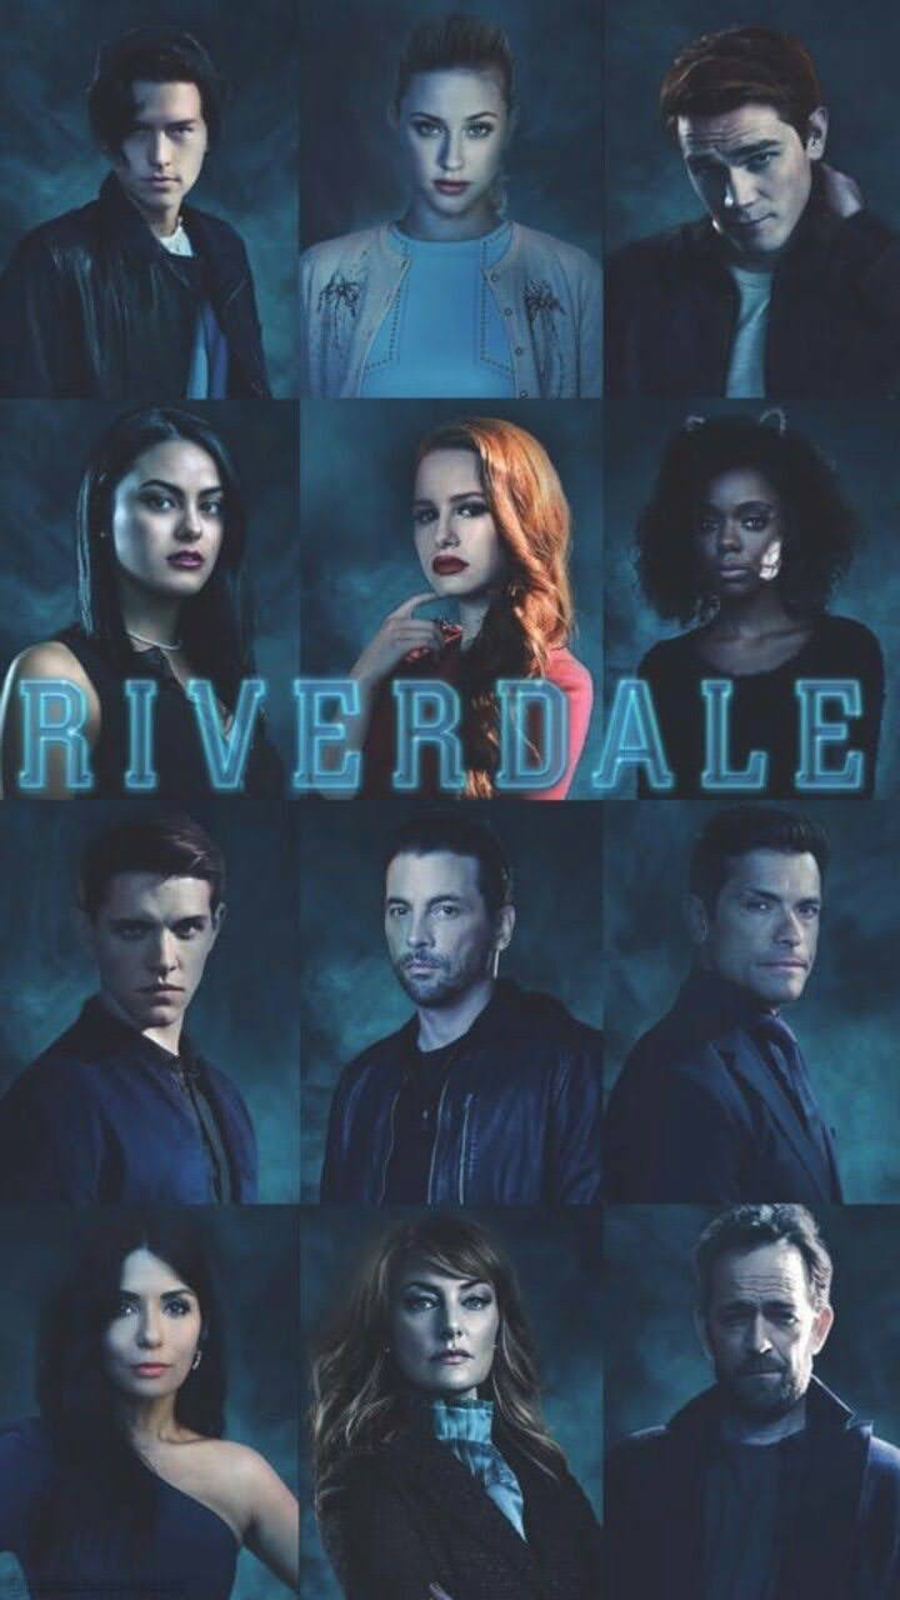 Rıverdale Full HD Wallpapers Free Download